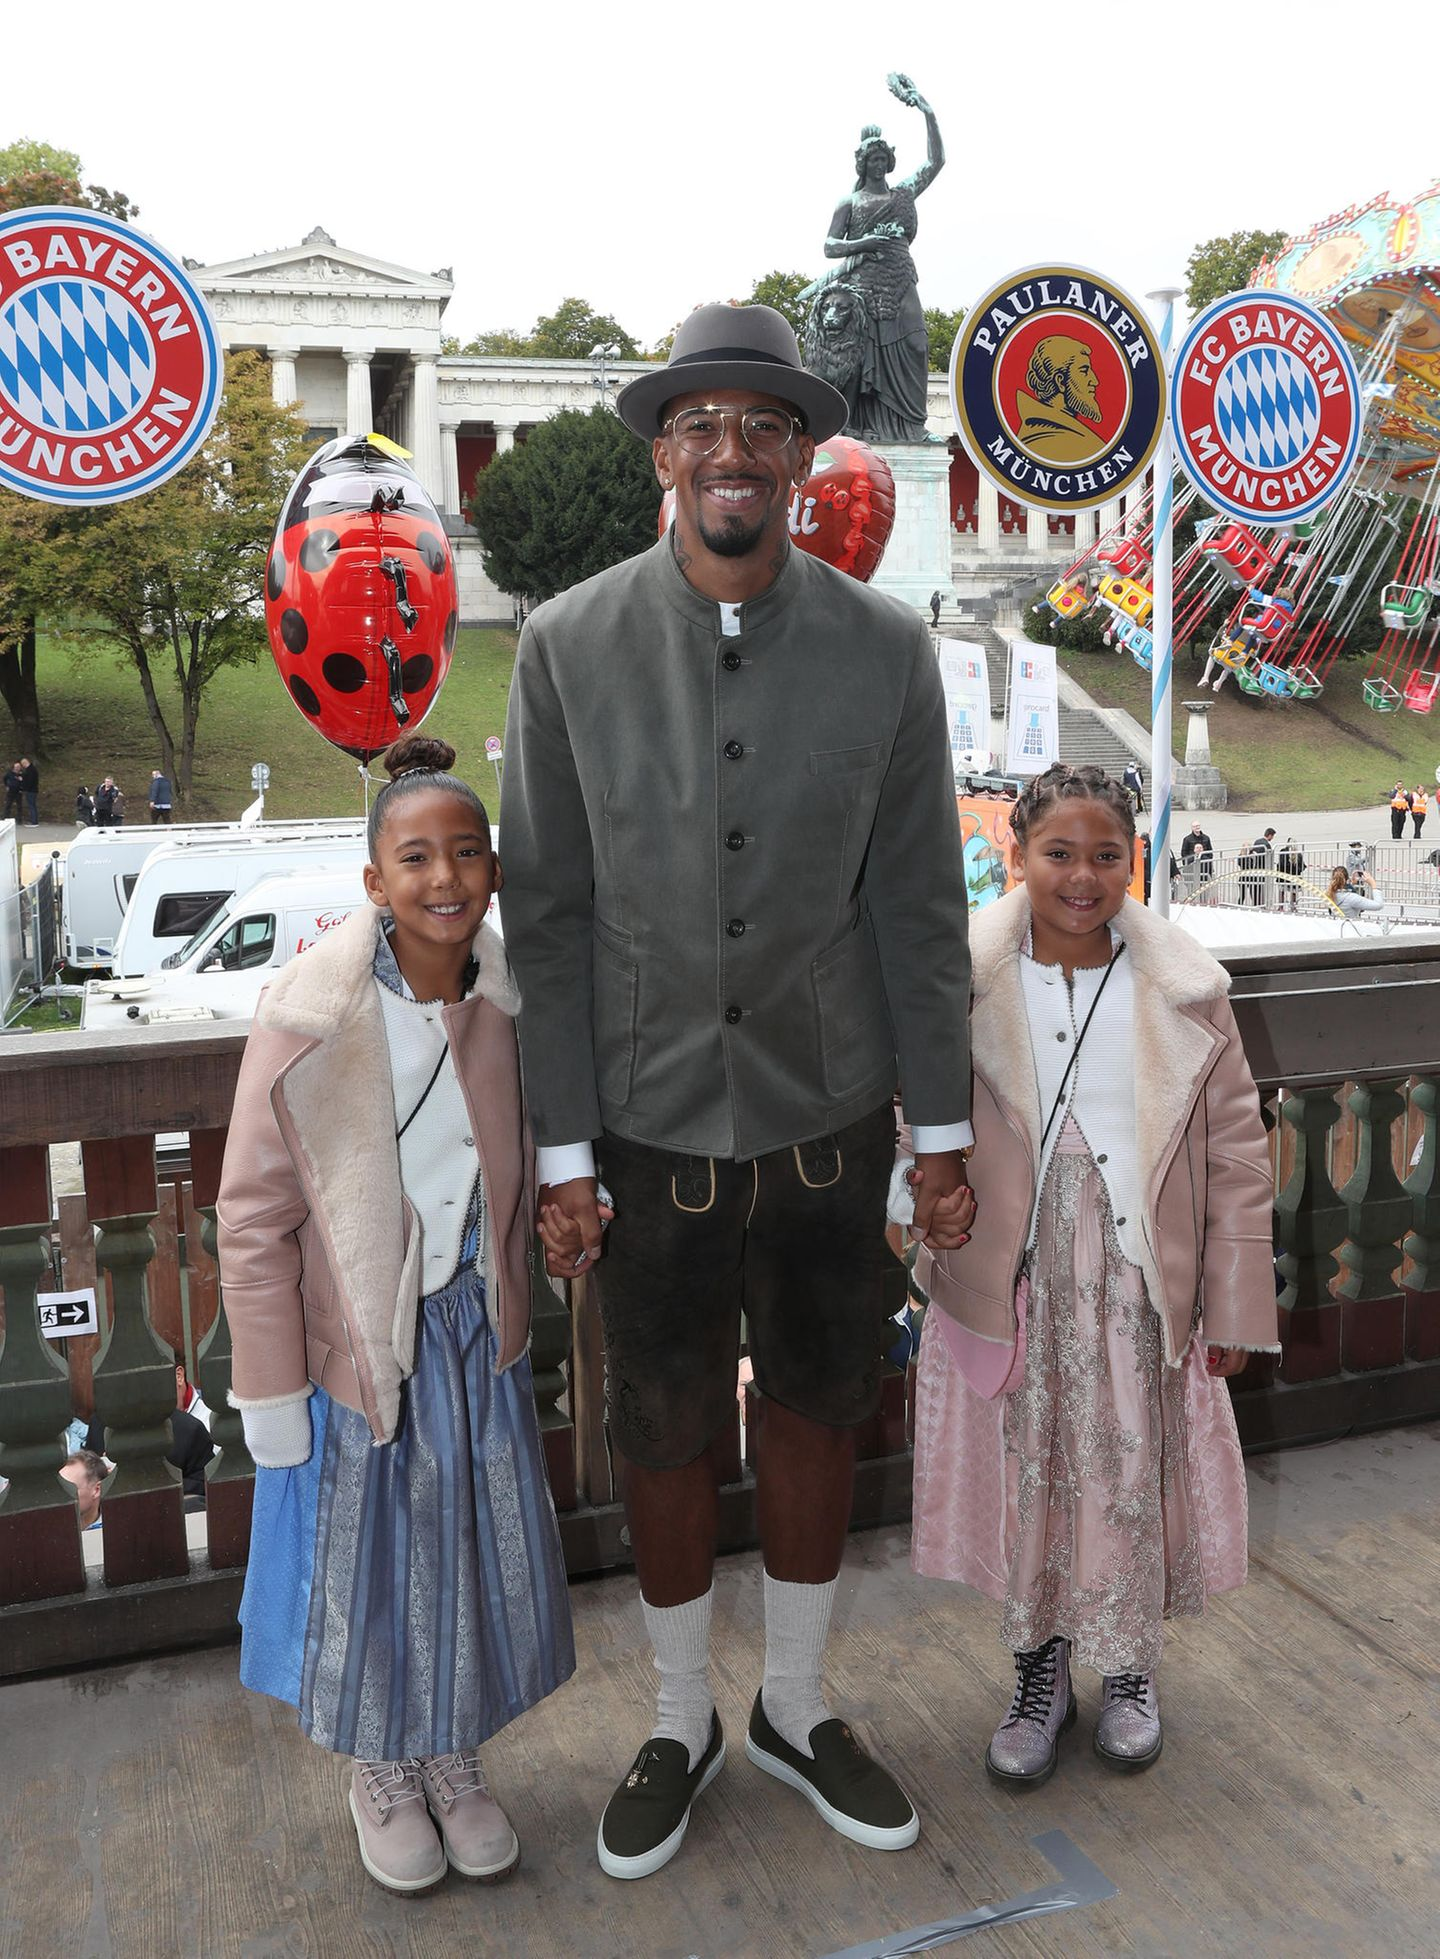 Oktoberfest 2019: Jérôme Boateng kommt in reizender Begleitung seiner zwei Töchter zur Wiesn.